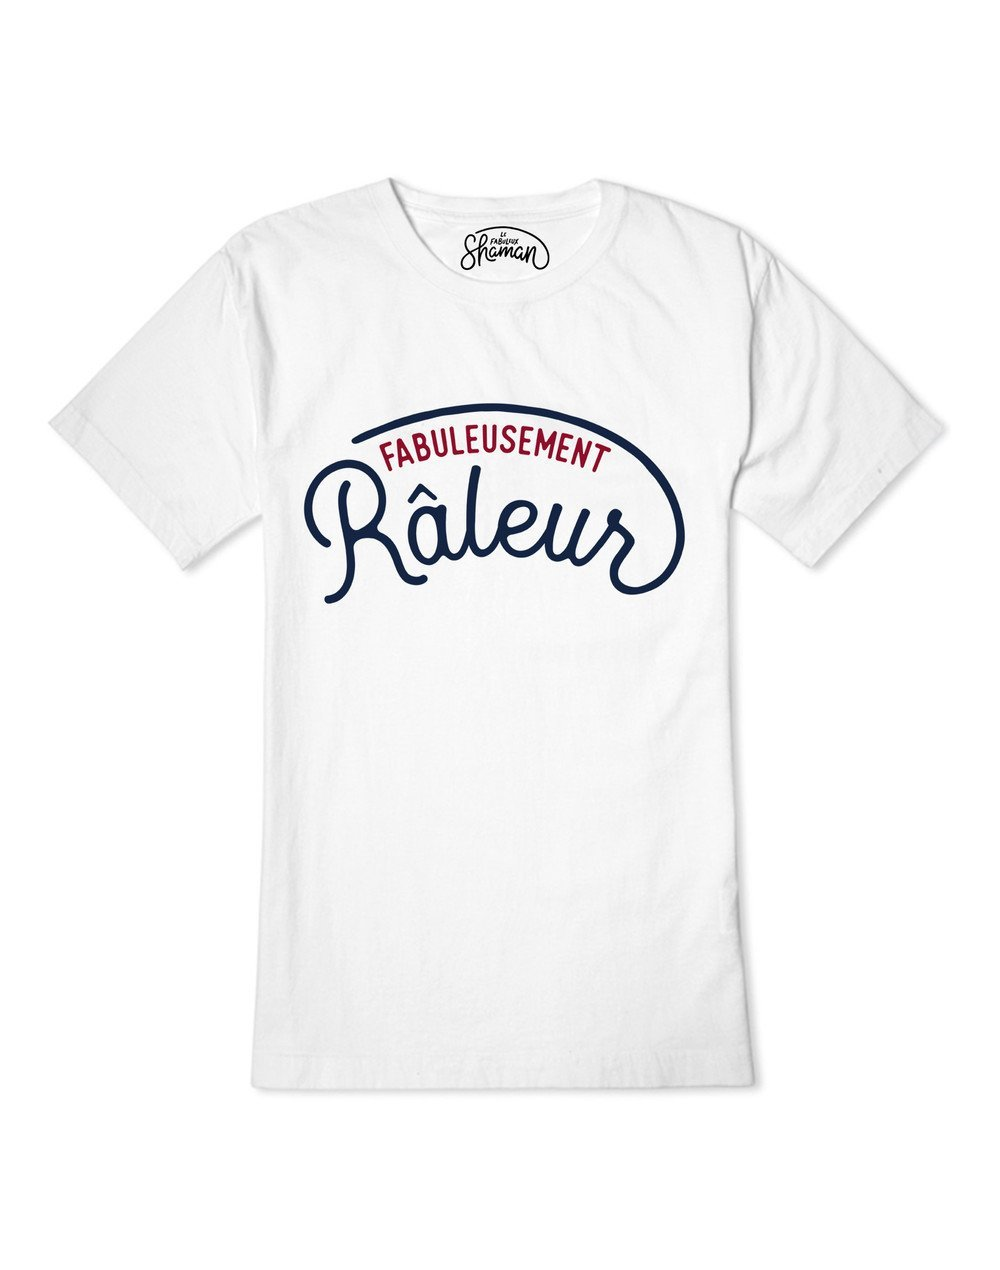 "Tee shirt ""Fabuleusement râleur"""